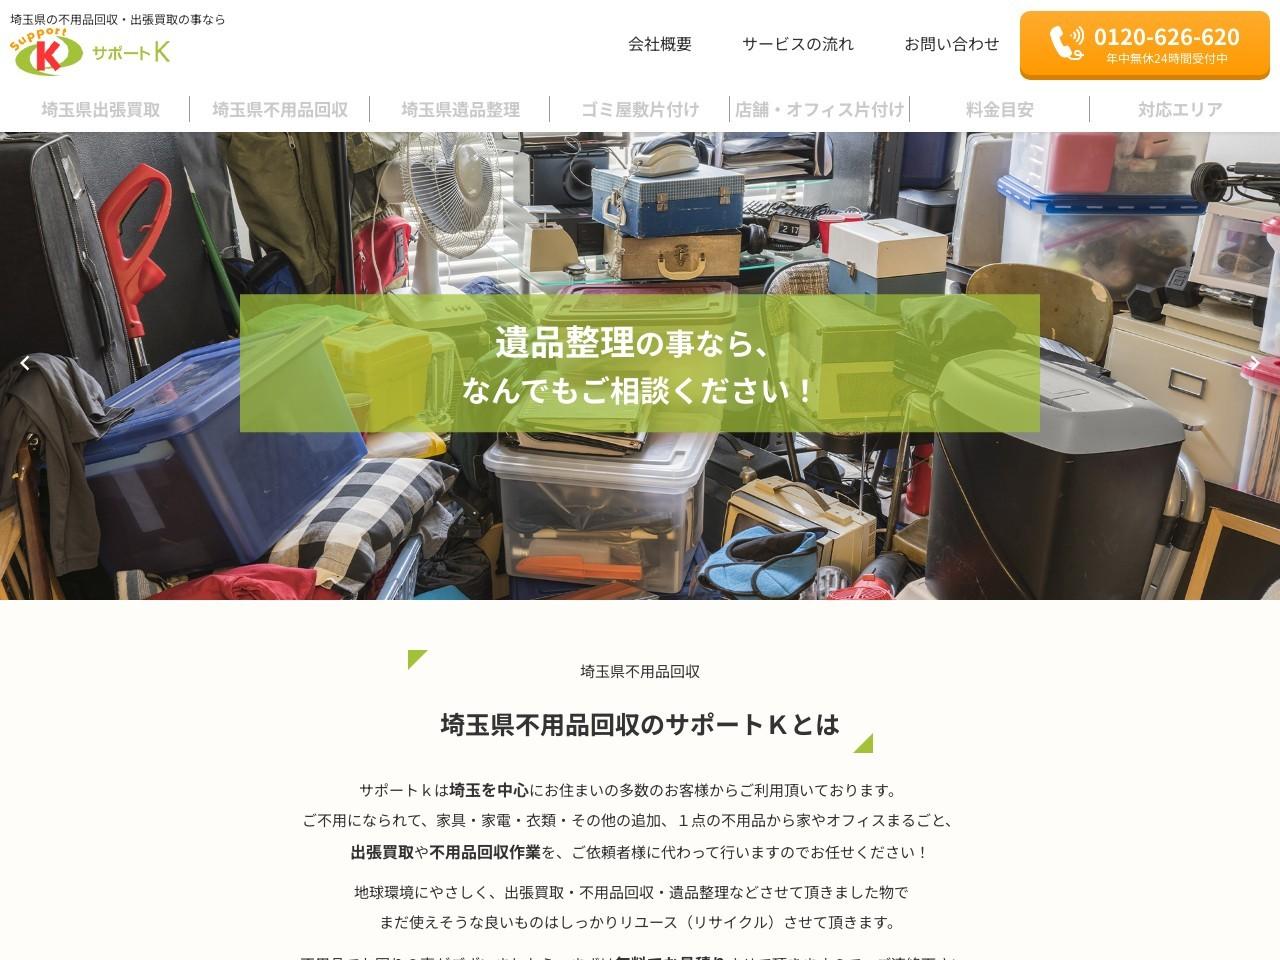 不用品引取・買取・片付け・遺品整理のサポートK--埼玉県越谷市